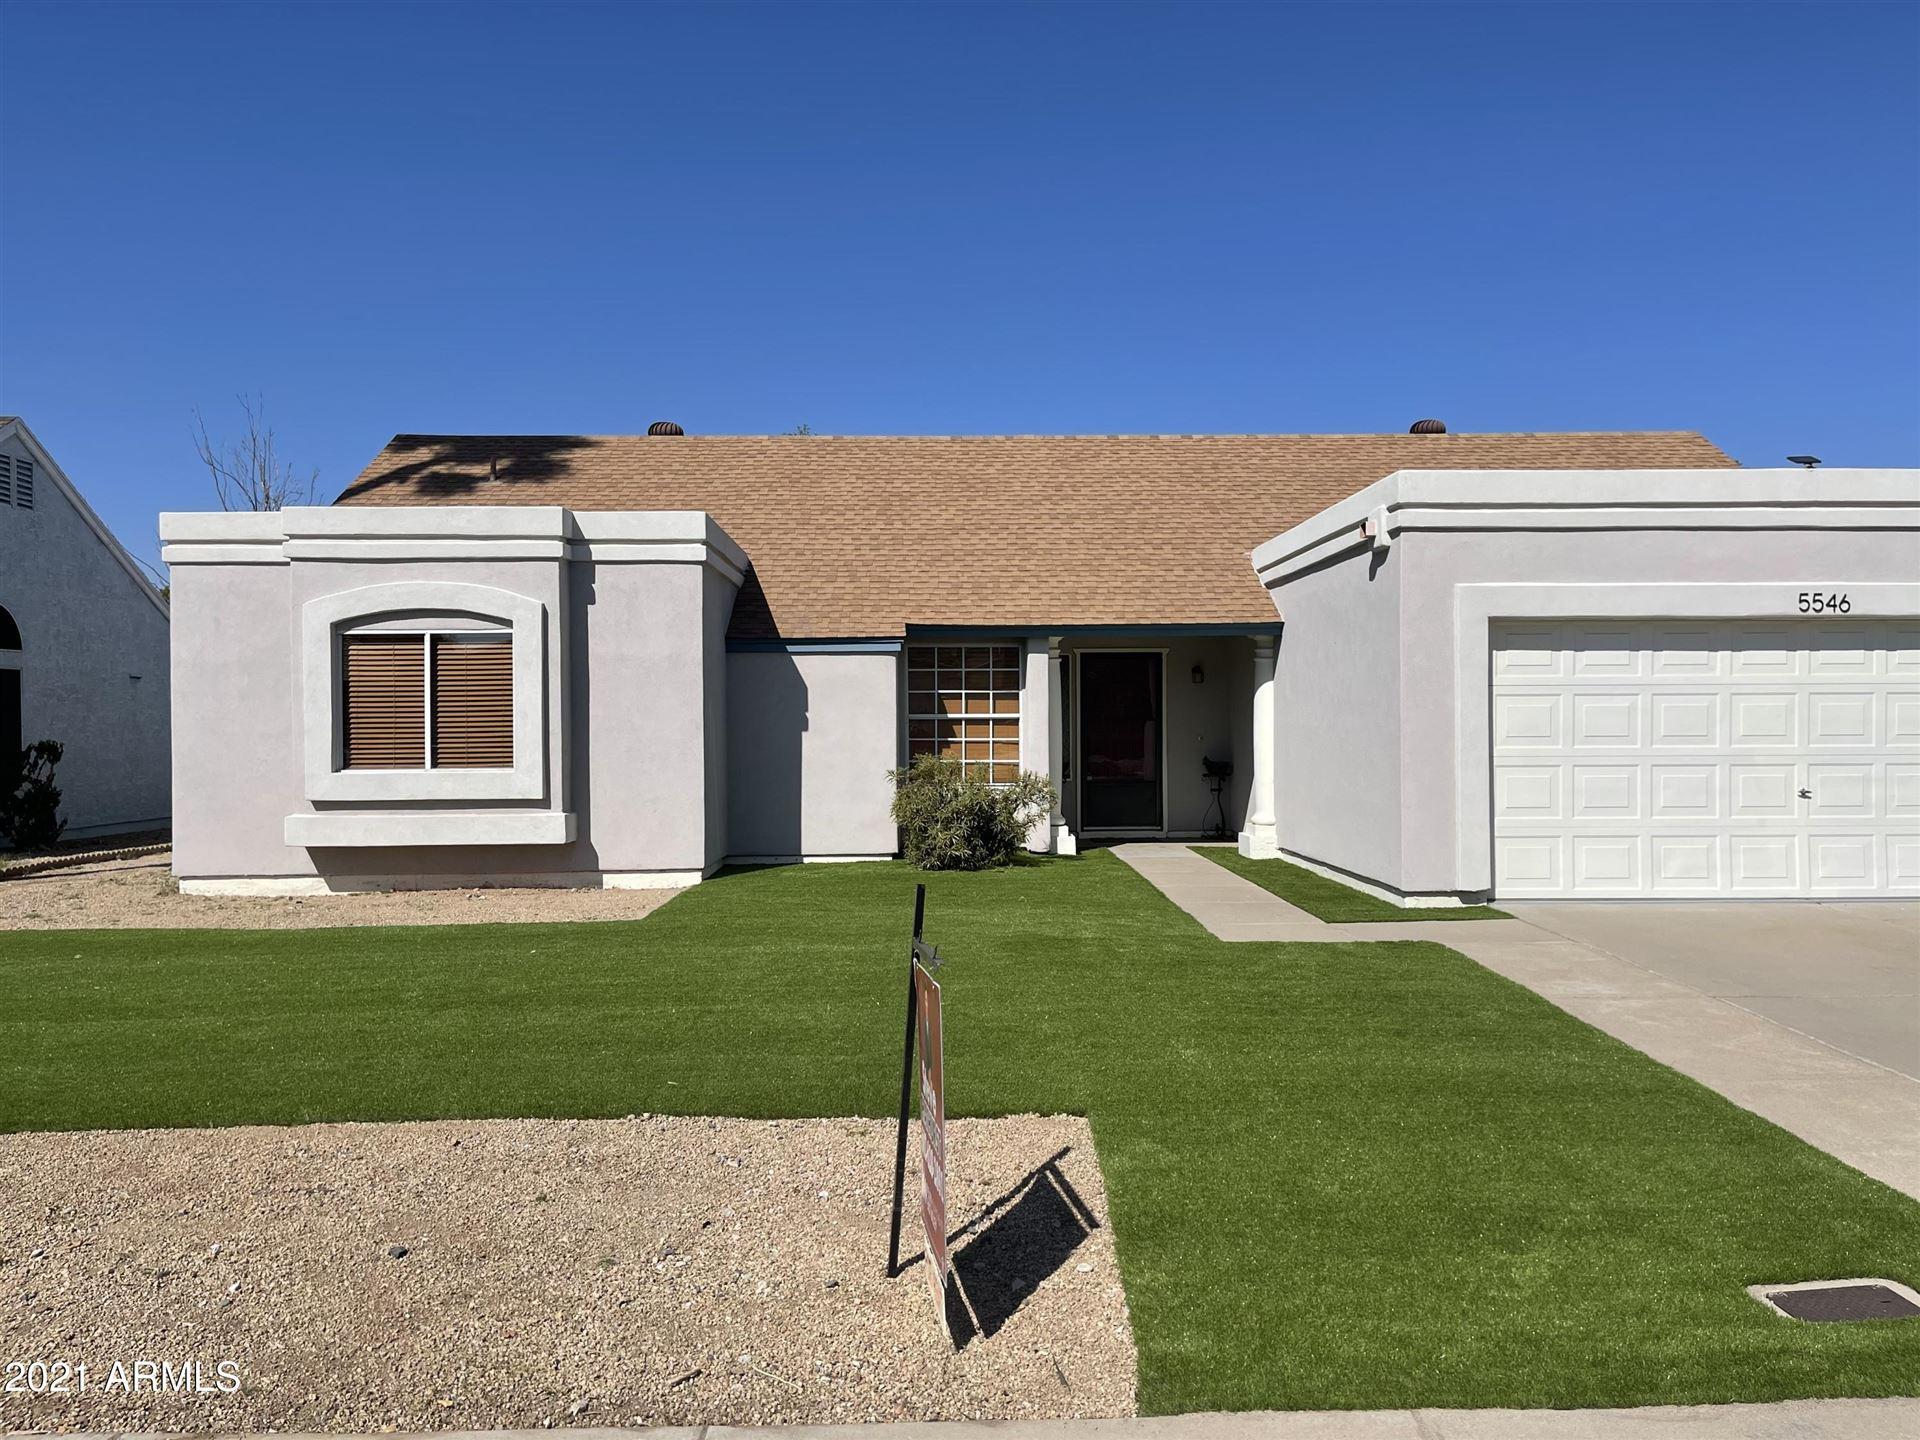 Photo of 5546 W DESERT COVE Avenue, Glendale, AZ 85304 (MLS # 6200634)